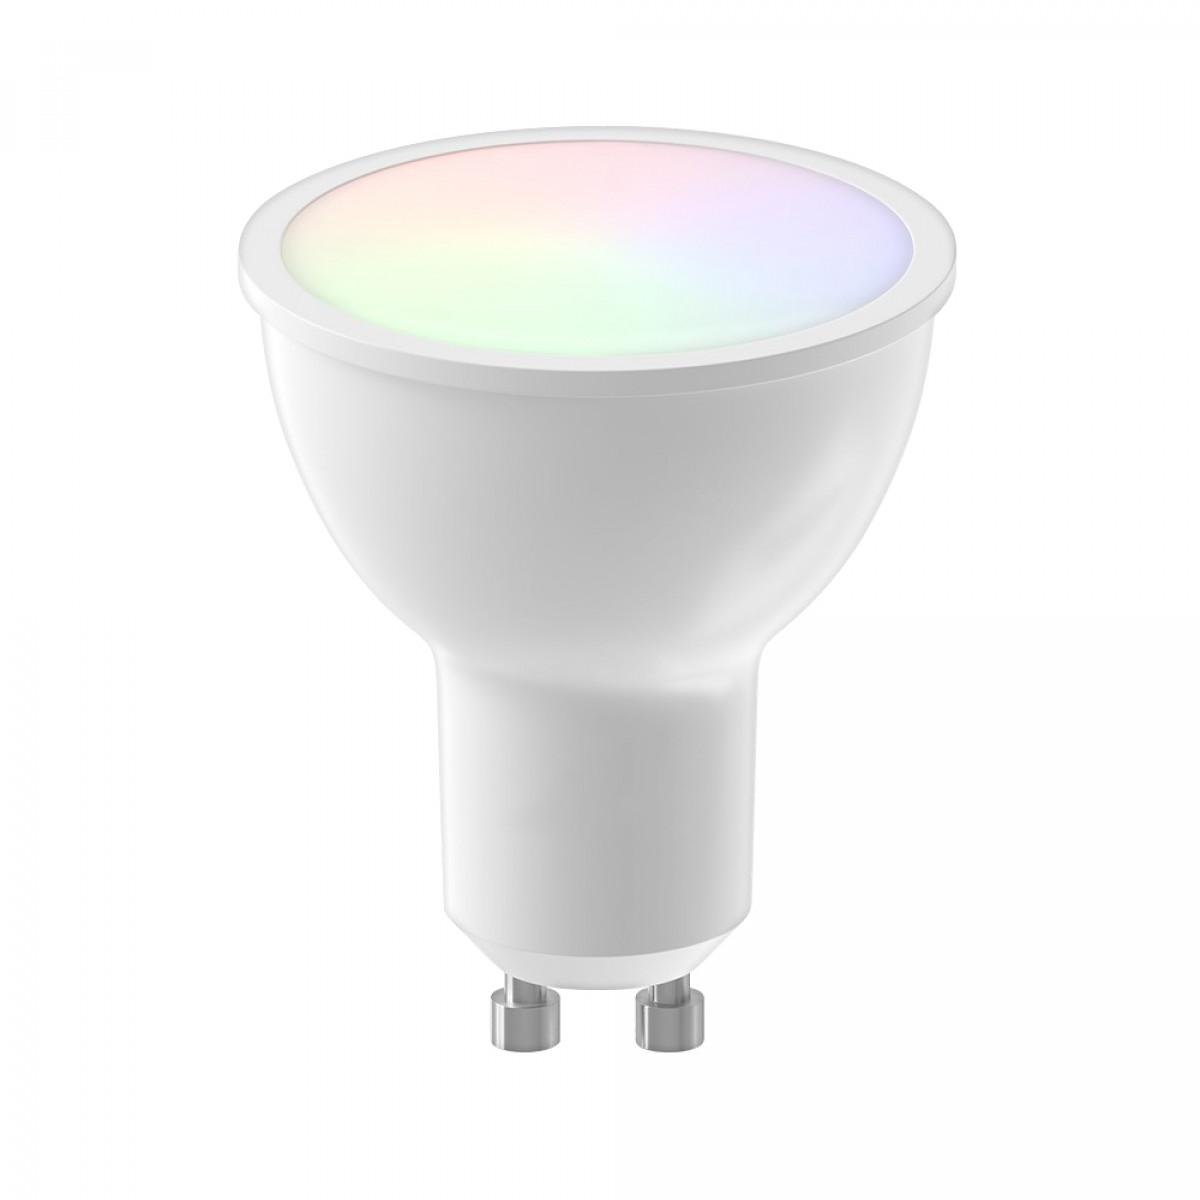 Smart wifi RGB Reflector led lamp 5W 350lm 2200-4000K